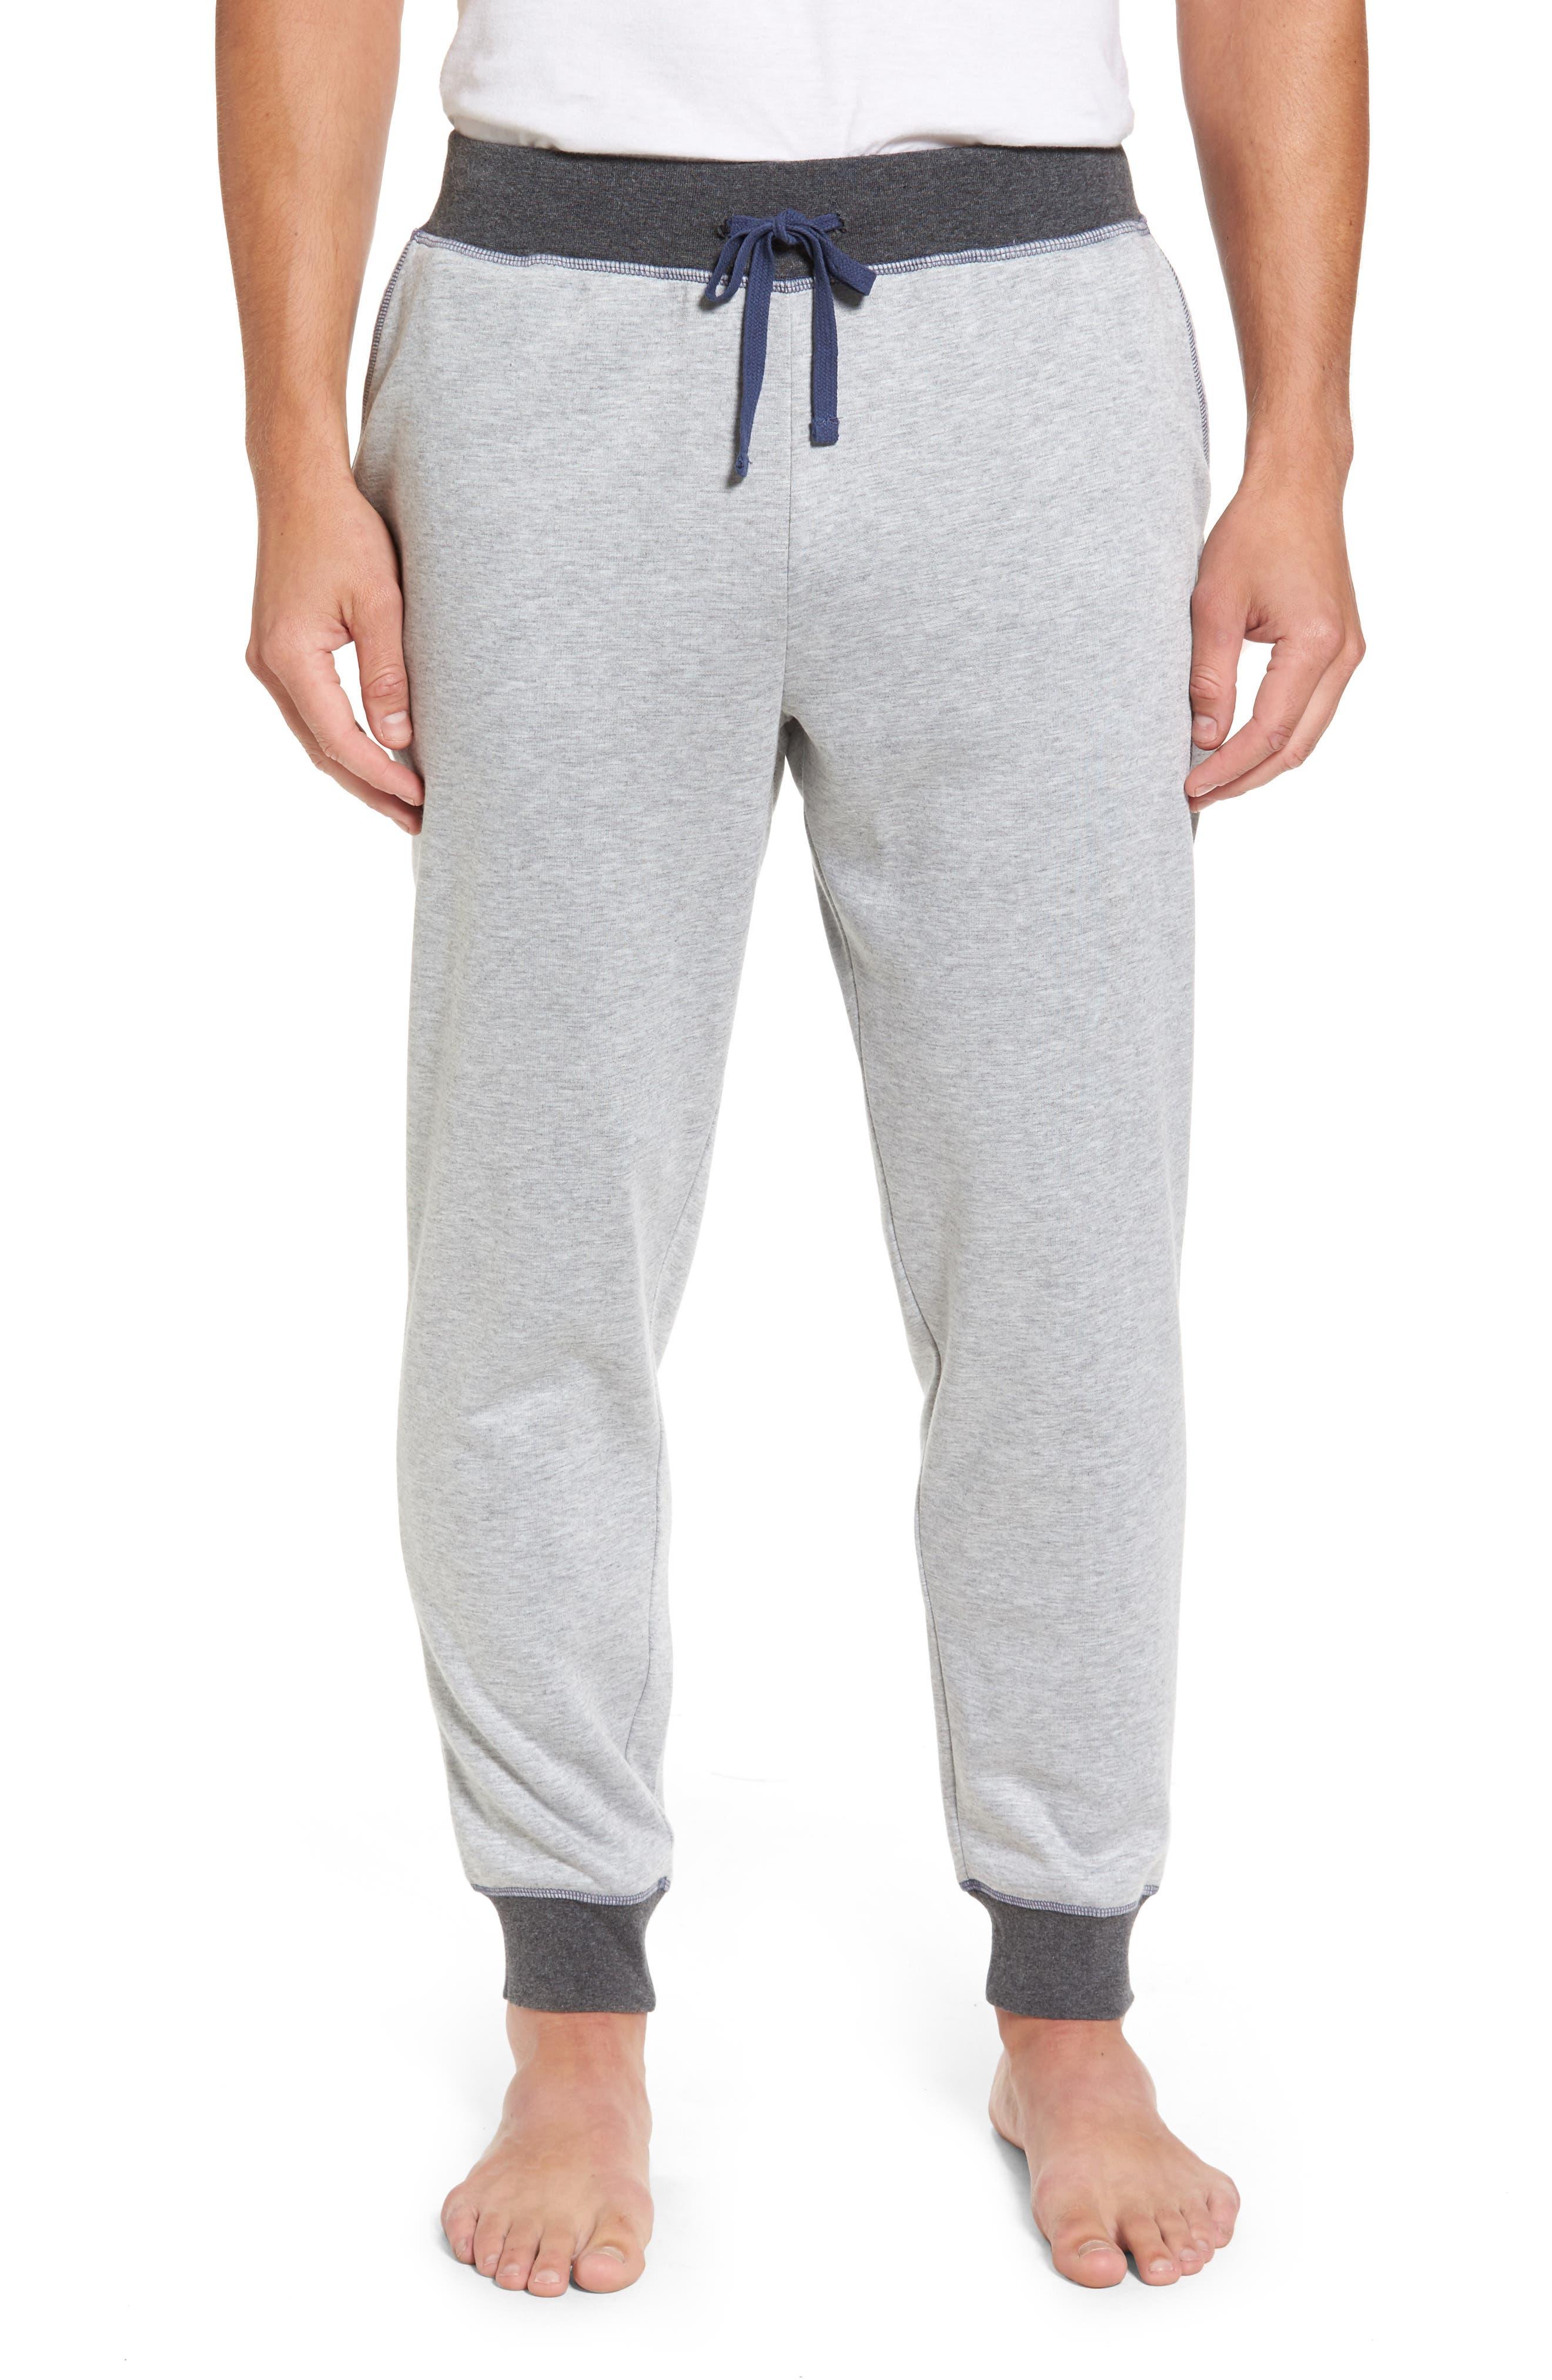 Double Take Knit Lounge Pants,                             Main thumbnail 1, color,                             Grey